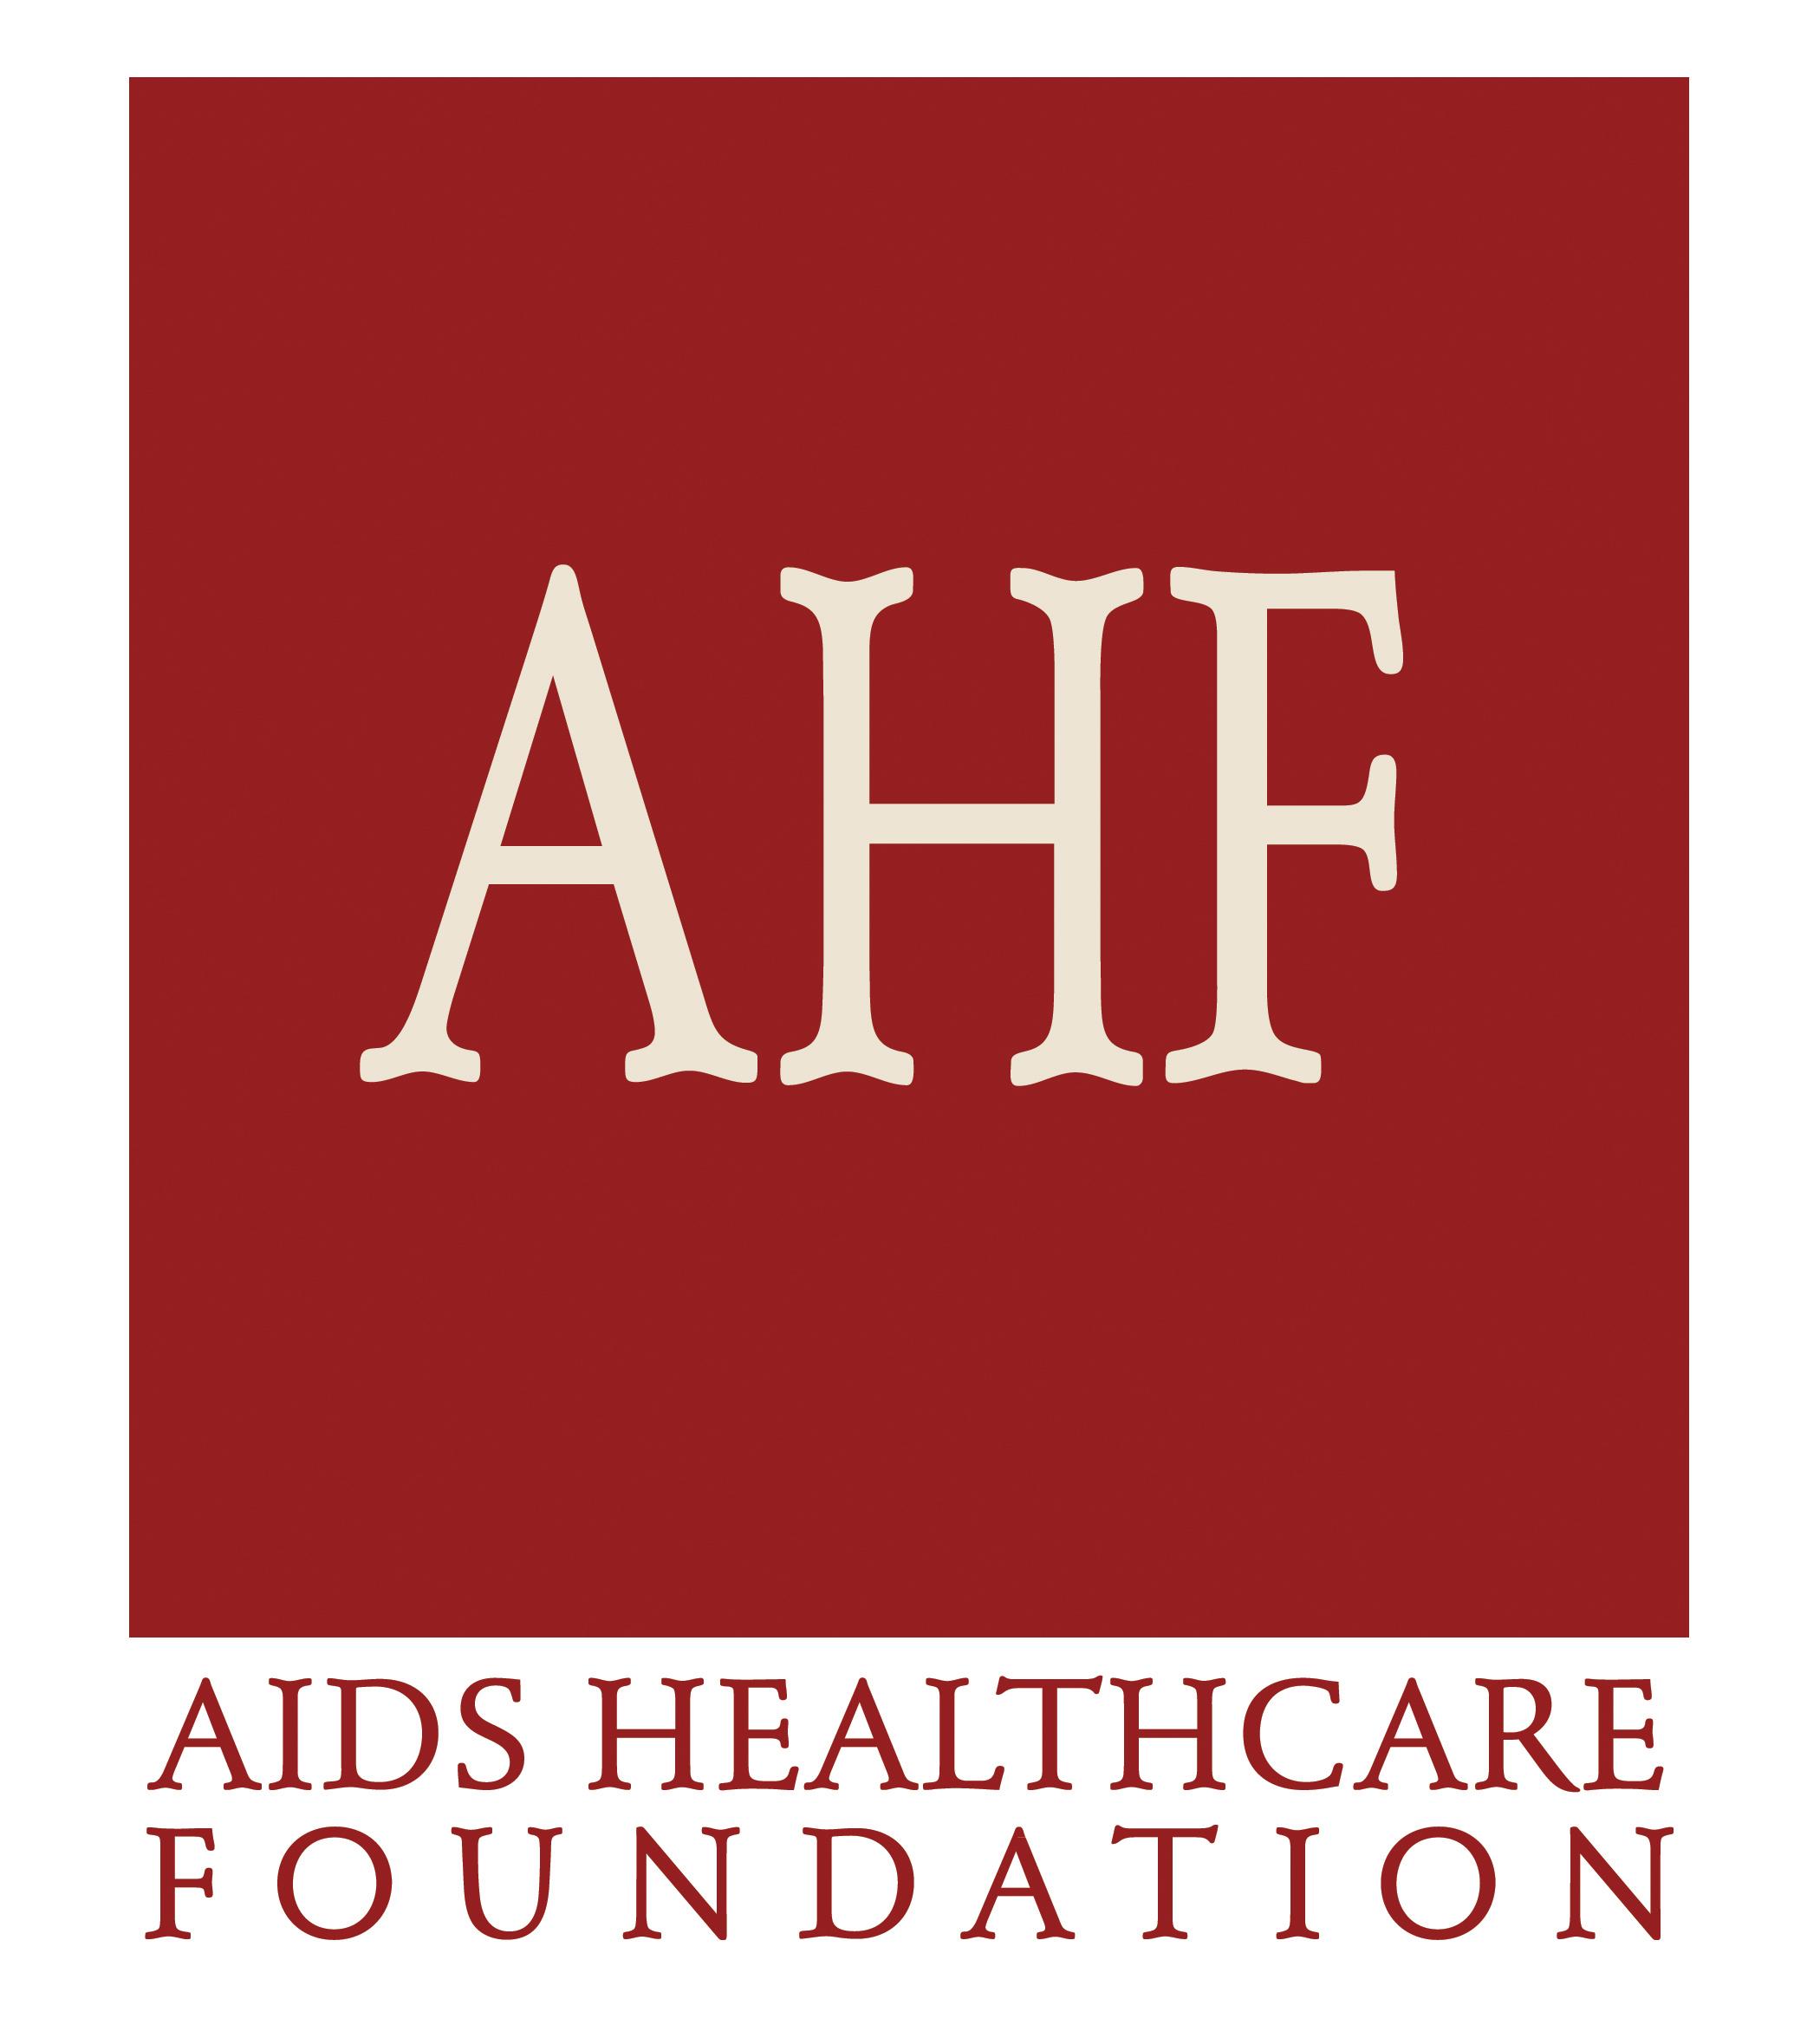 aids healthcare foundation.jpg